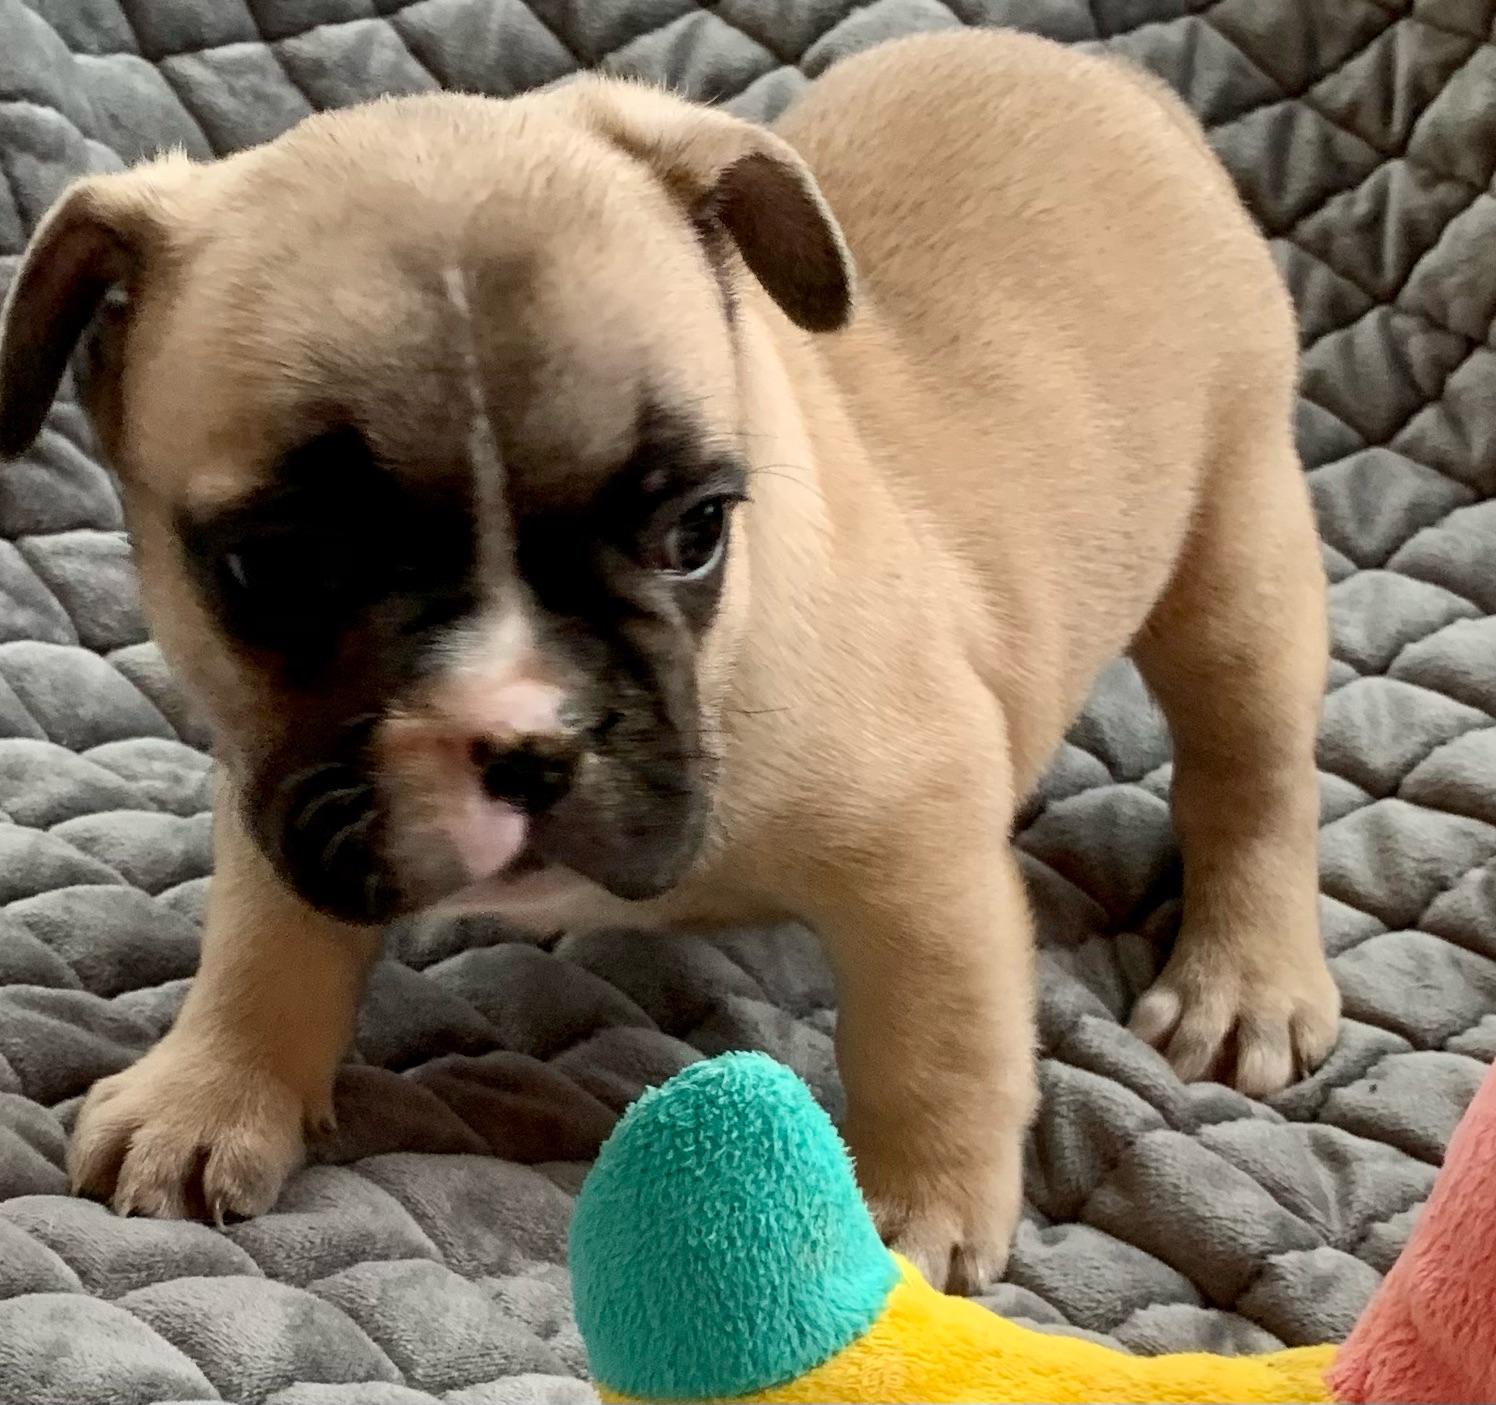 Fawn Male French Bulldog: Ireland-4582- Sold